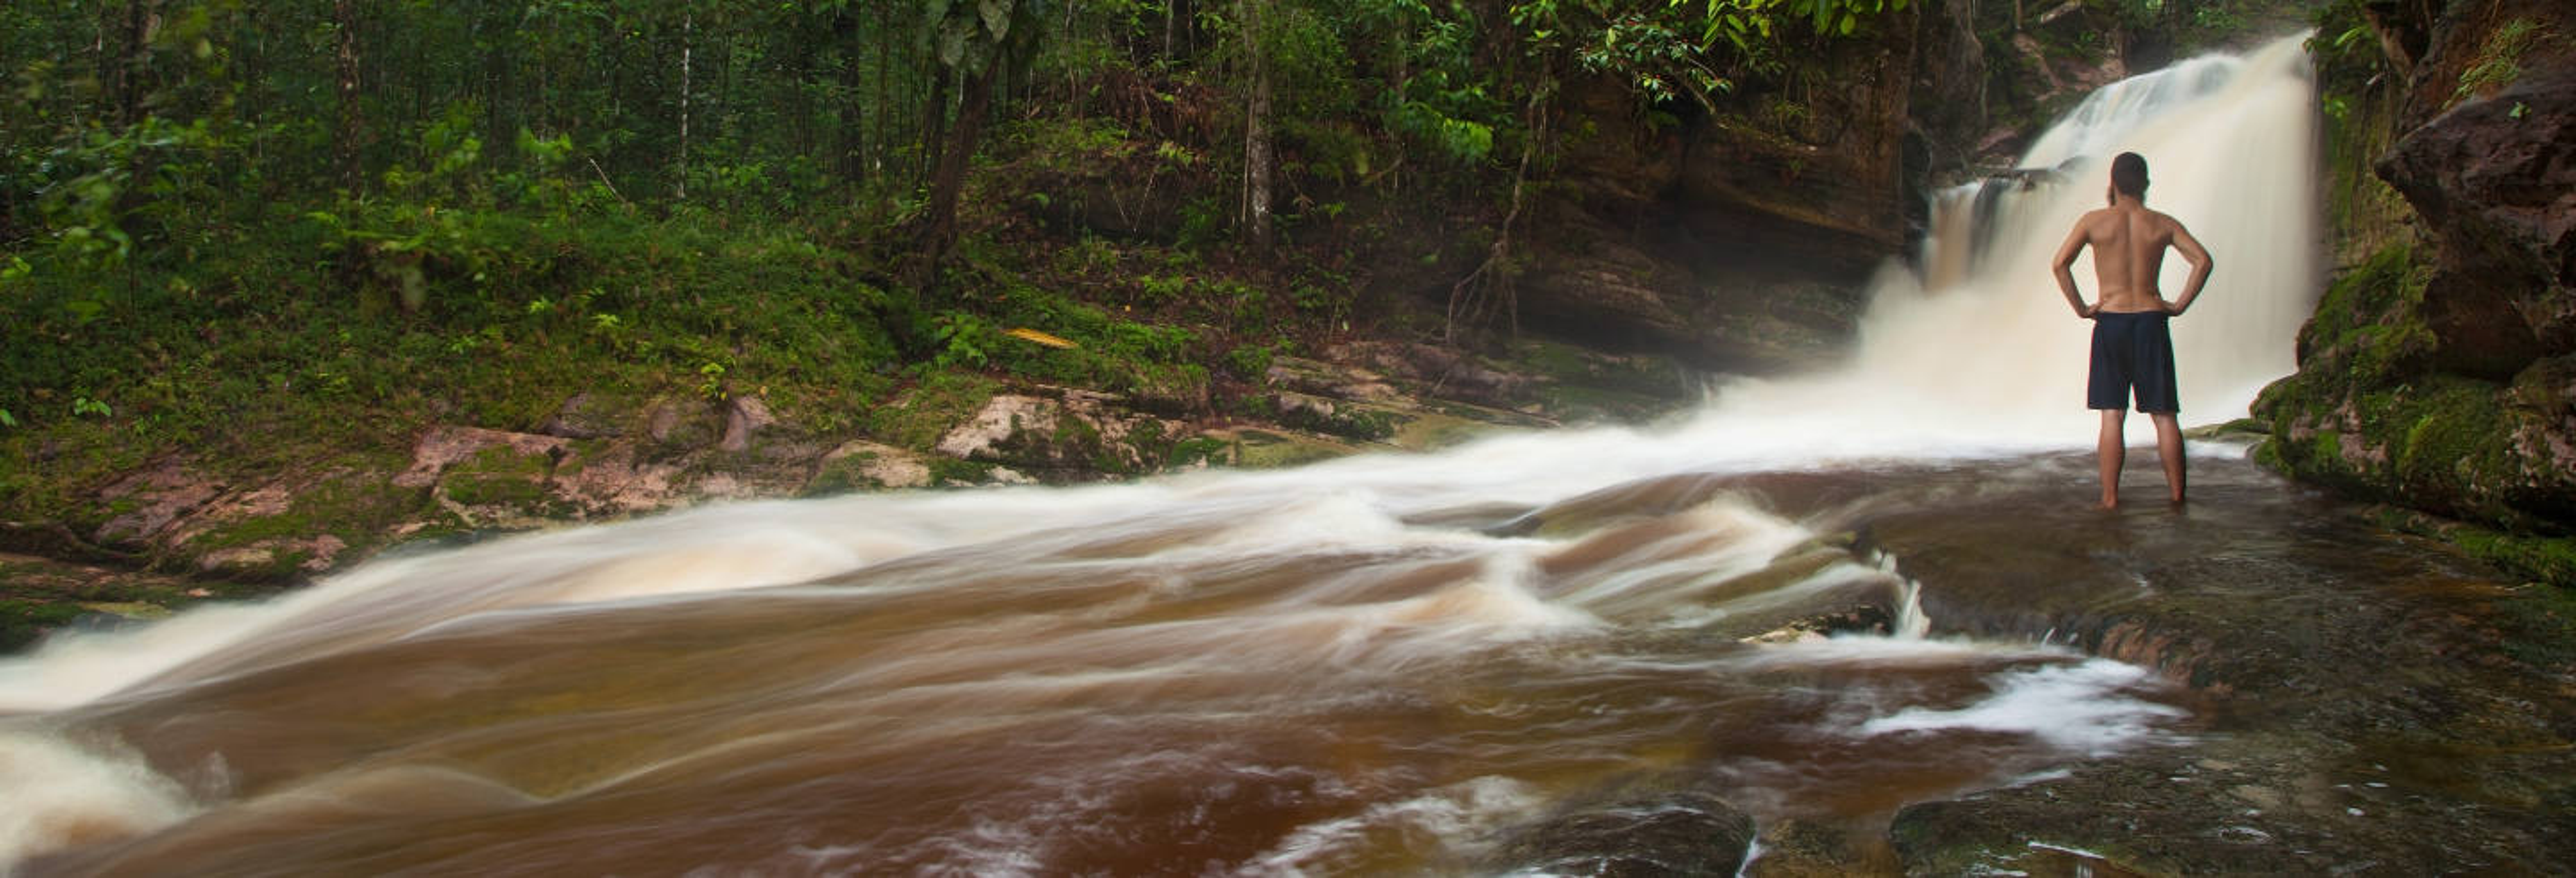 Excursión a las cataratas amazónicas